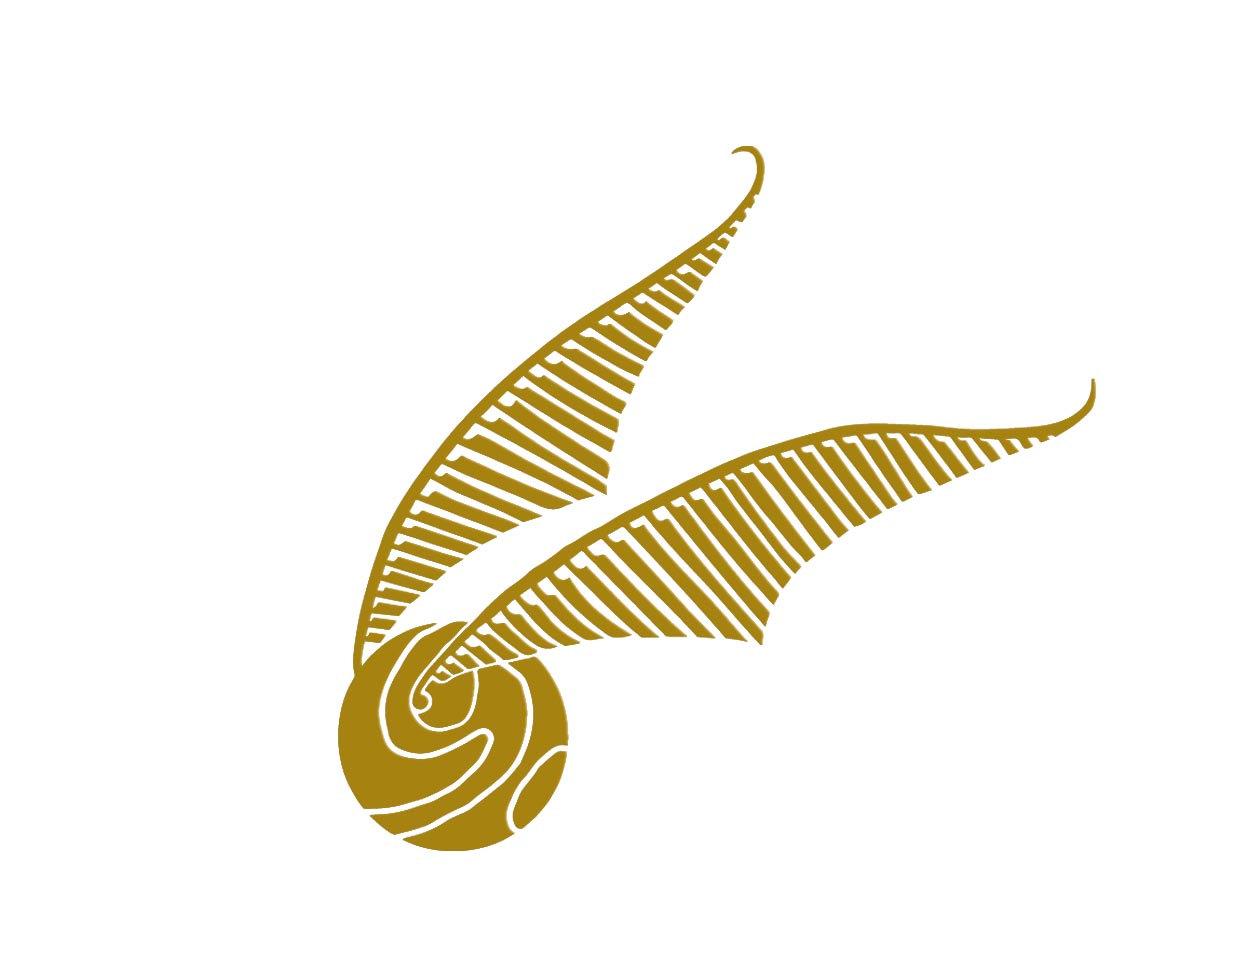 1237x977 Golden Snitch Clip Art Clipart